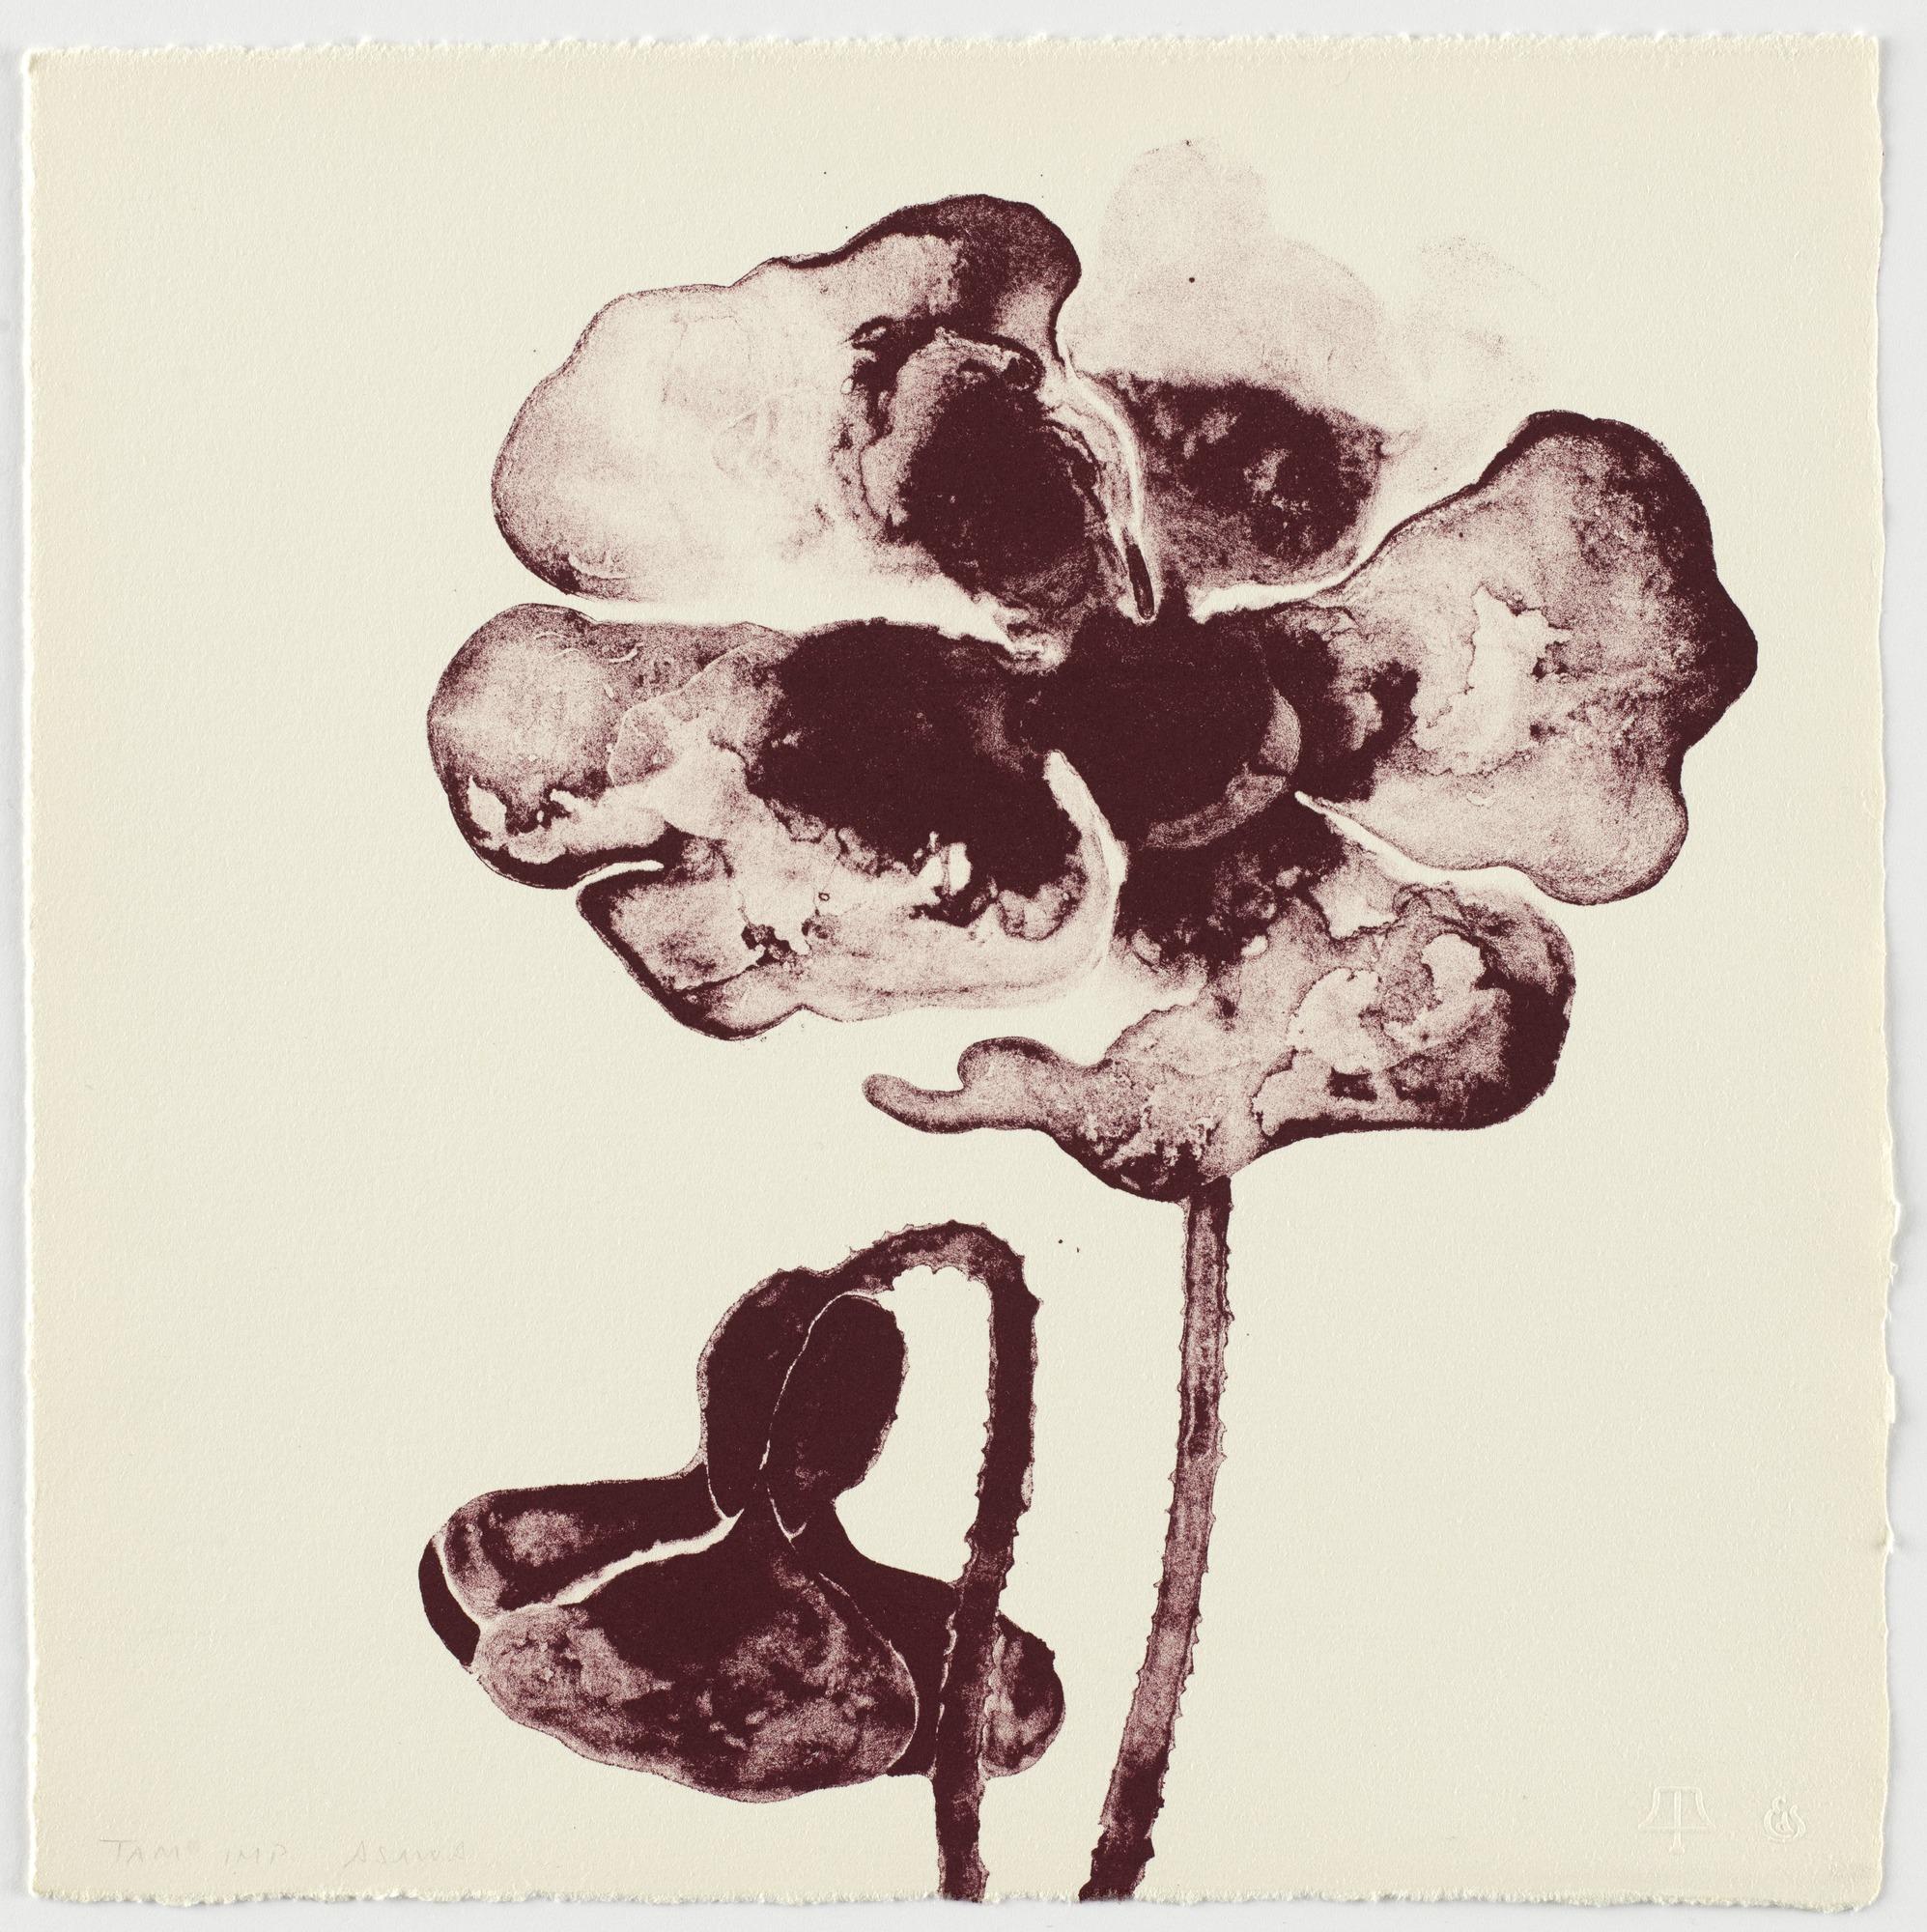 RUTH ASAWA | Untitled (Two Poppies) | 1965